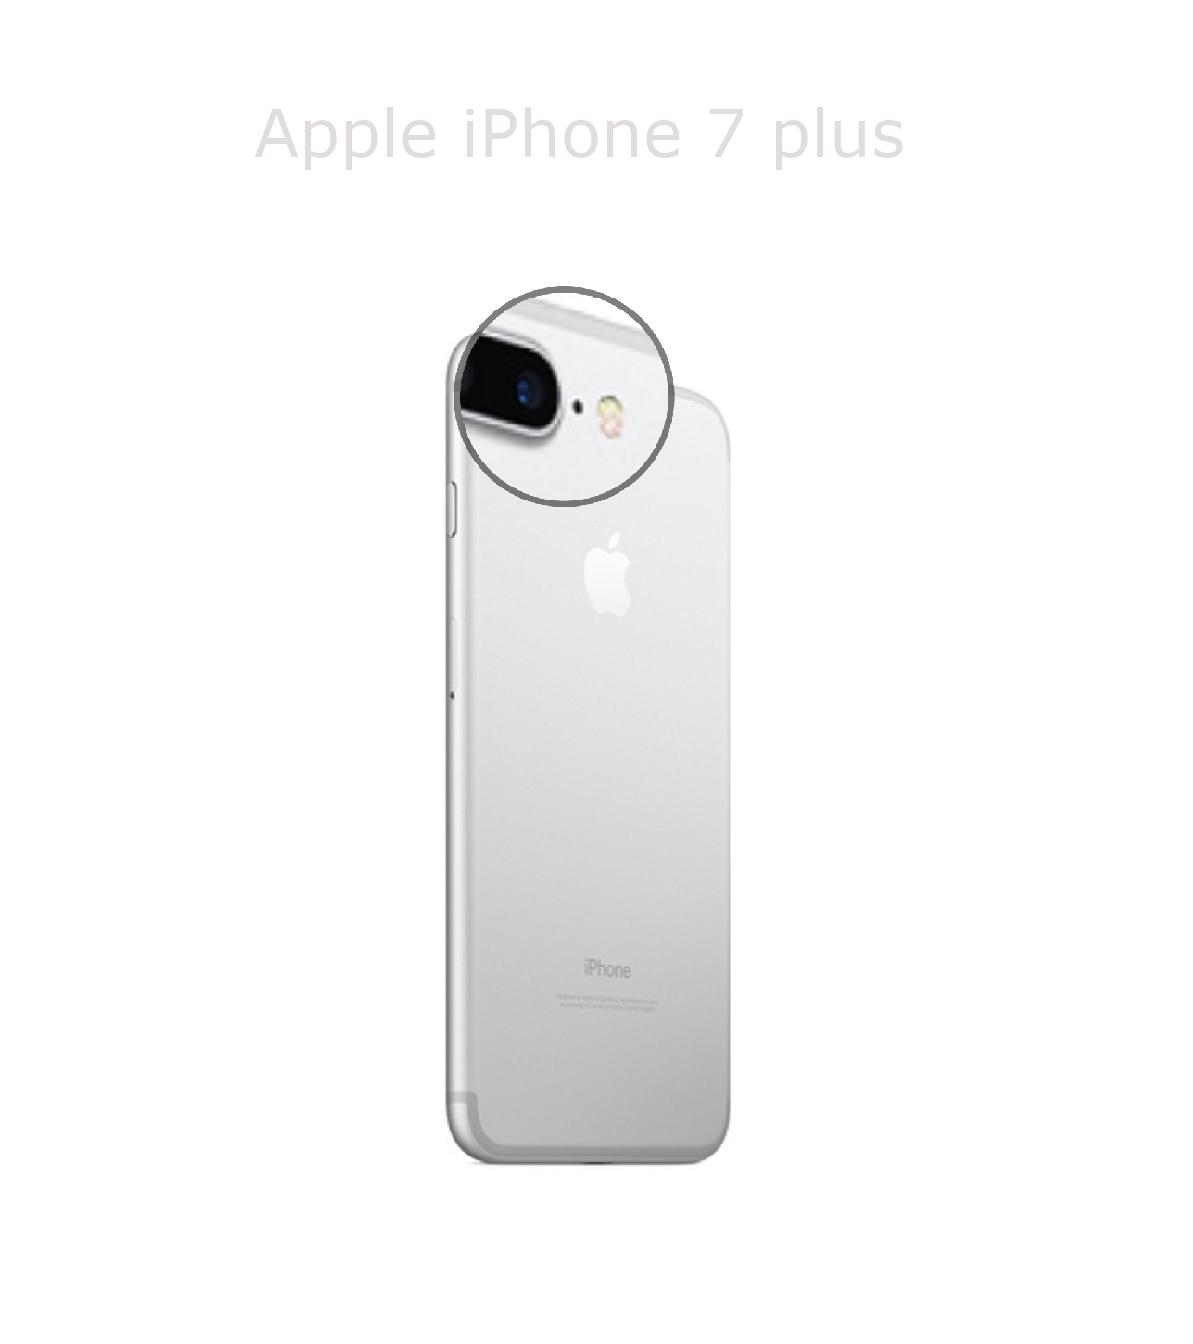 Laga mikrofon kamera iPhone 7 plus